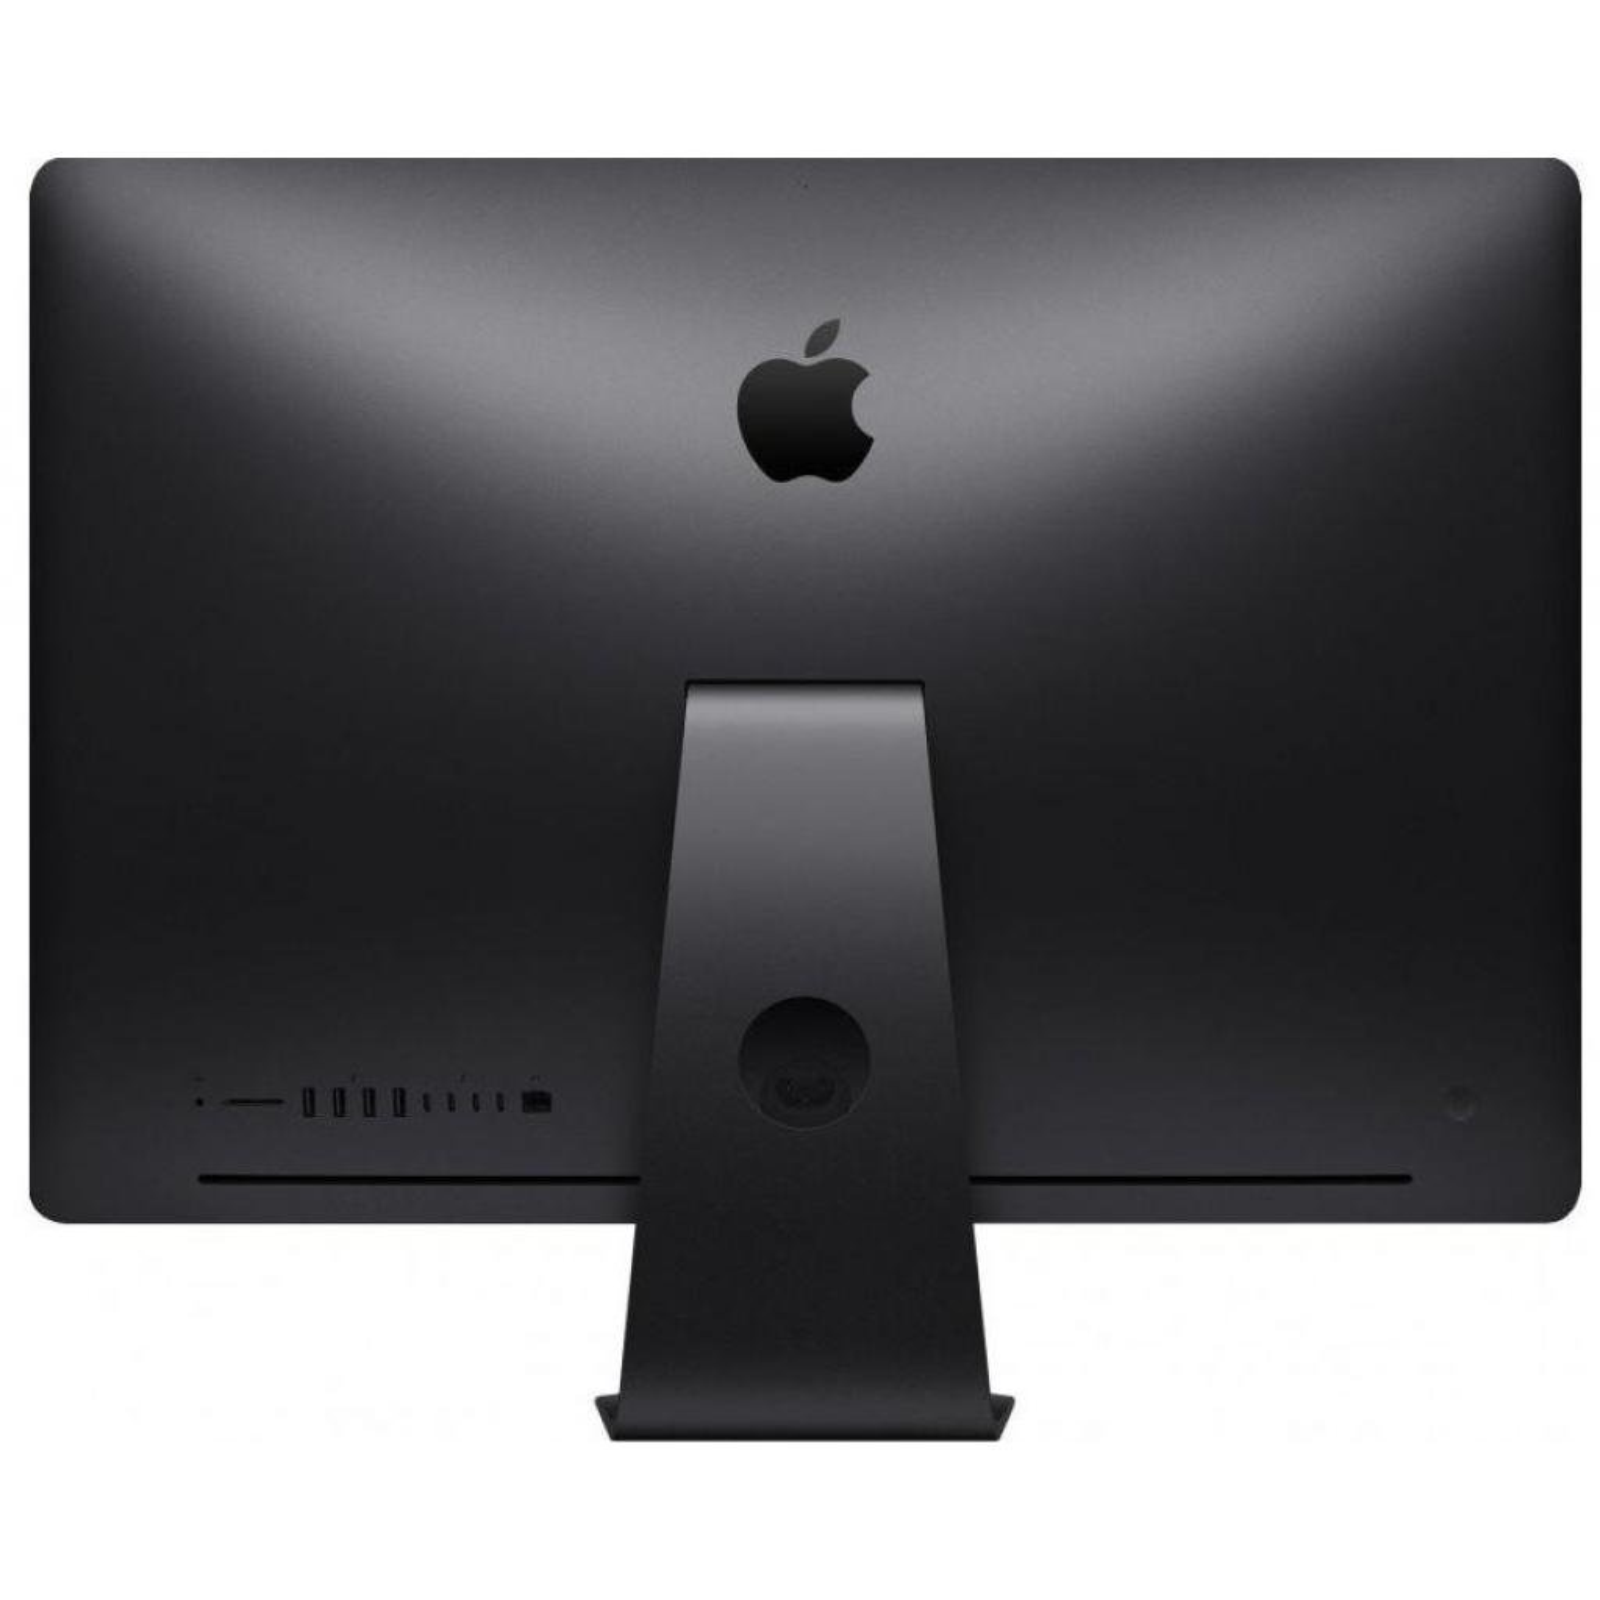 "Компьютер Apple A1862 iMac Pro 27"" Retina 5K (MQ2Y2UA/A) изображение 4"